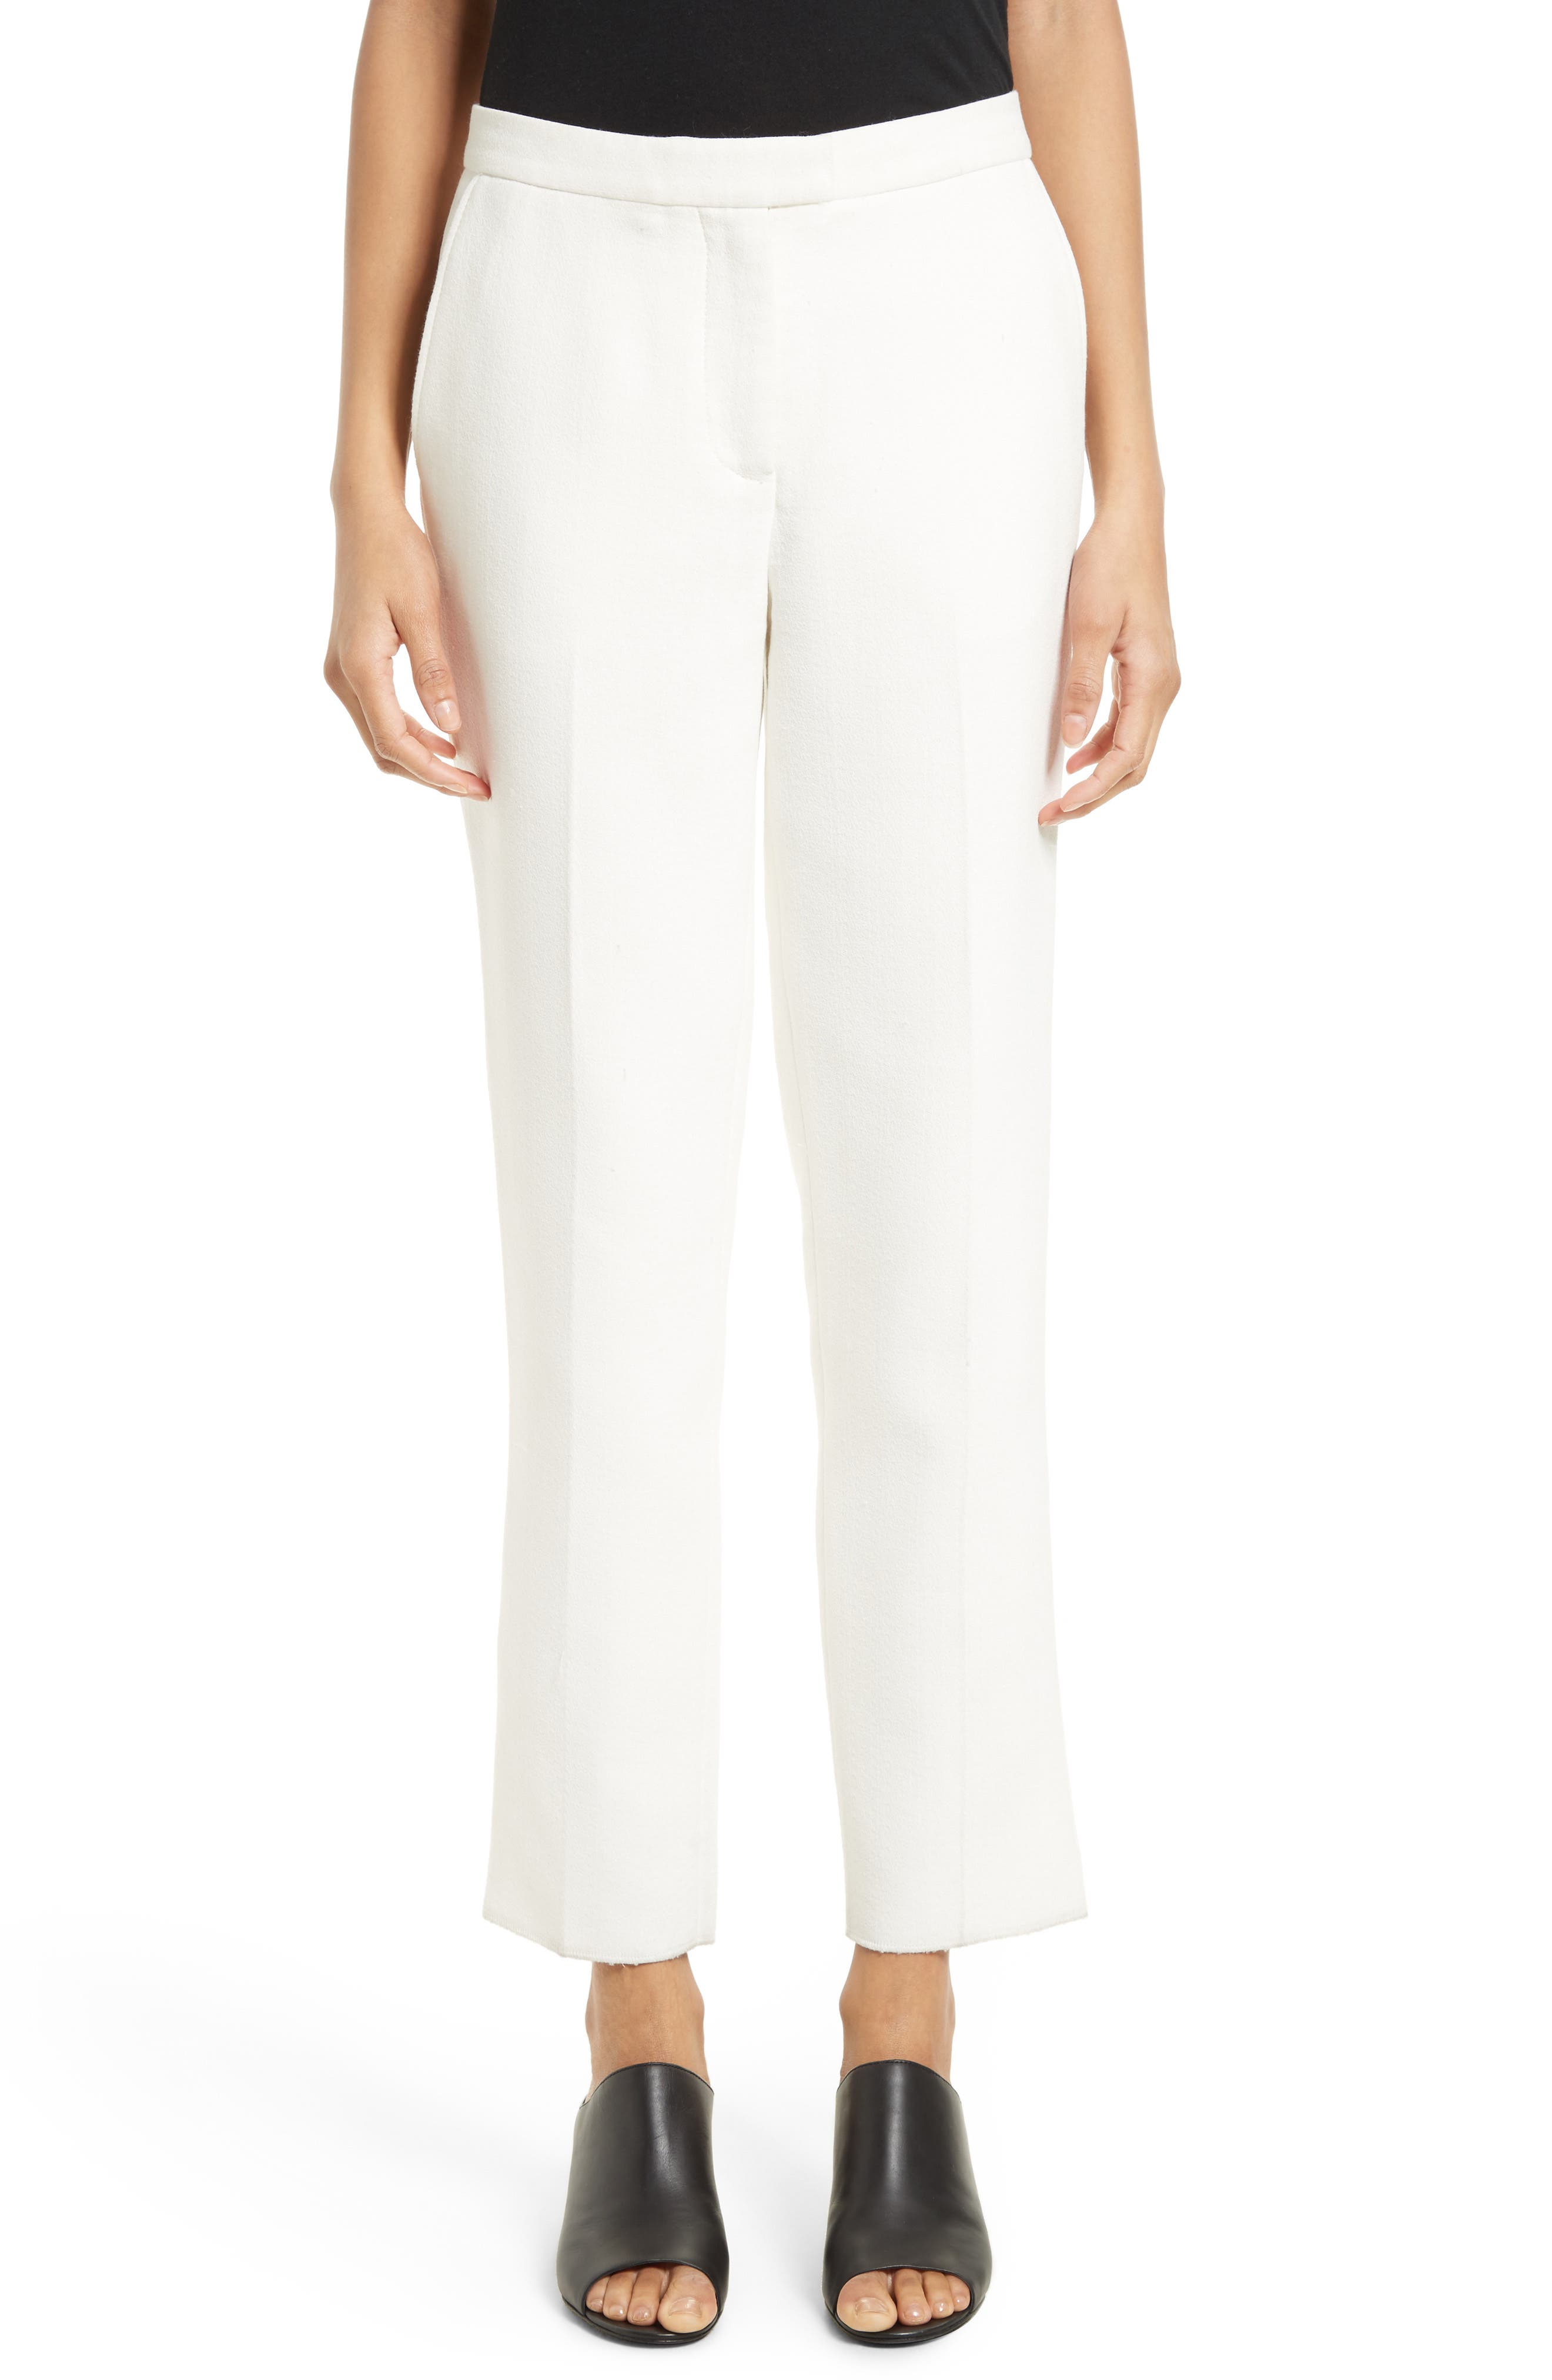 3.1 Phillip Lim Skinny Crop Needle Pants